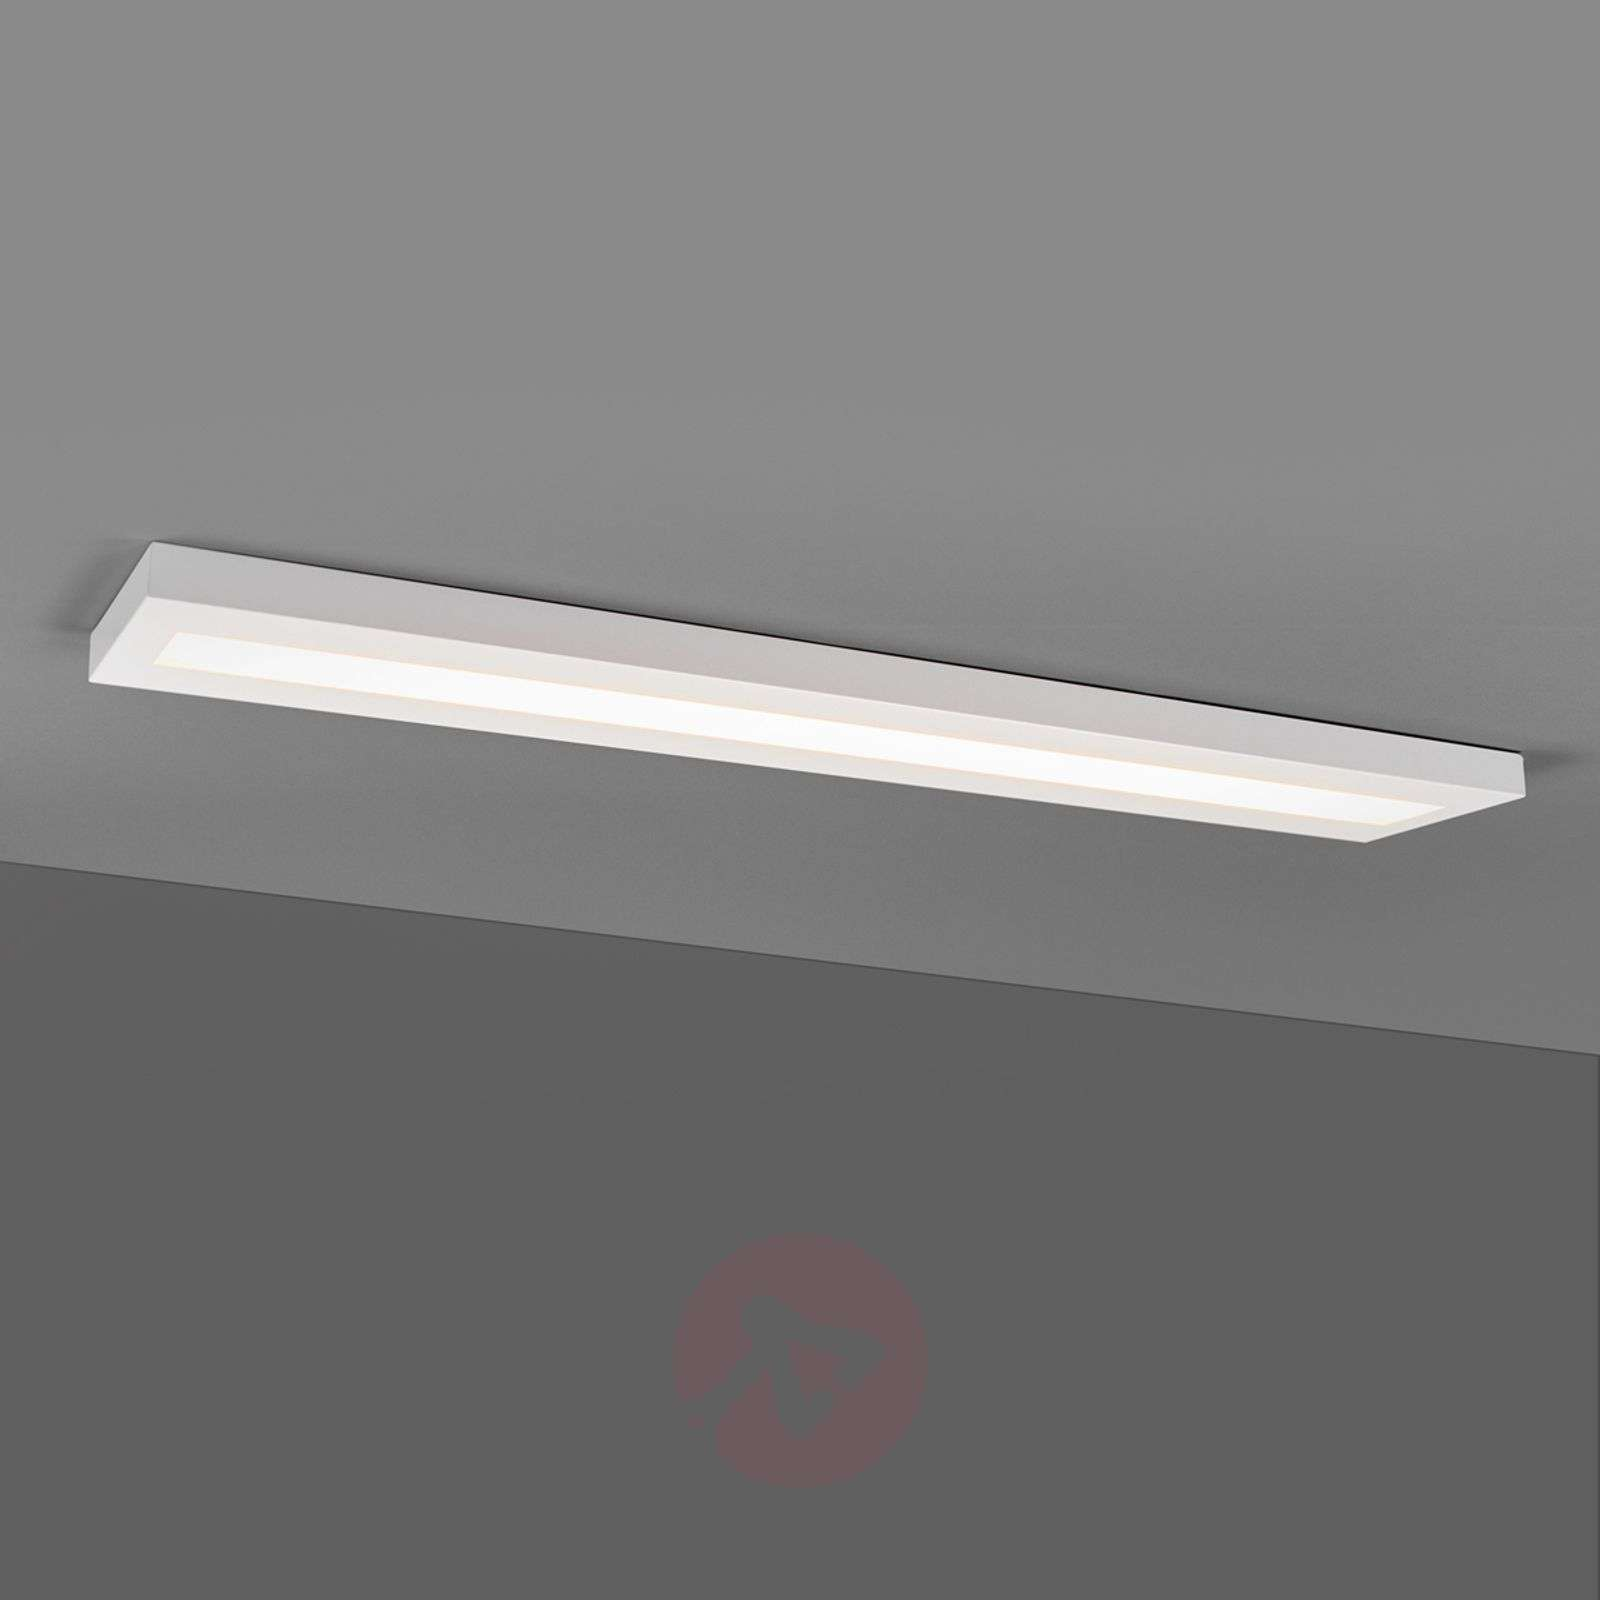 Plafoniere Led Osram : Slimline led light osram leds lights ie